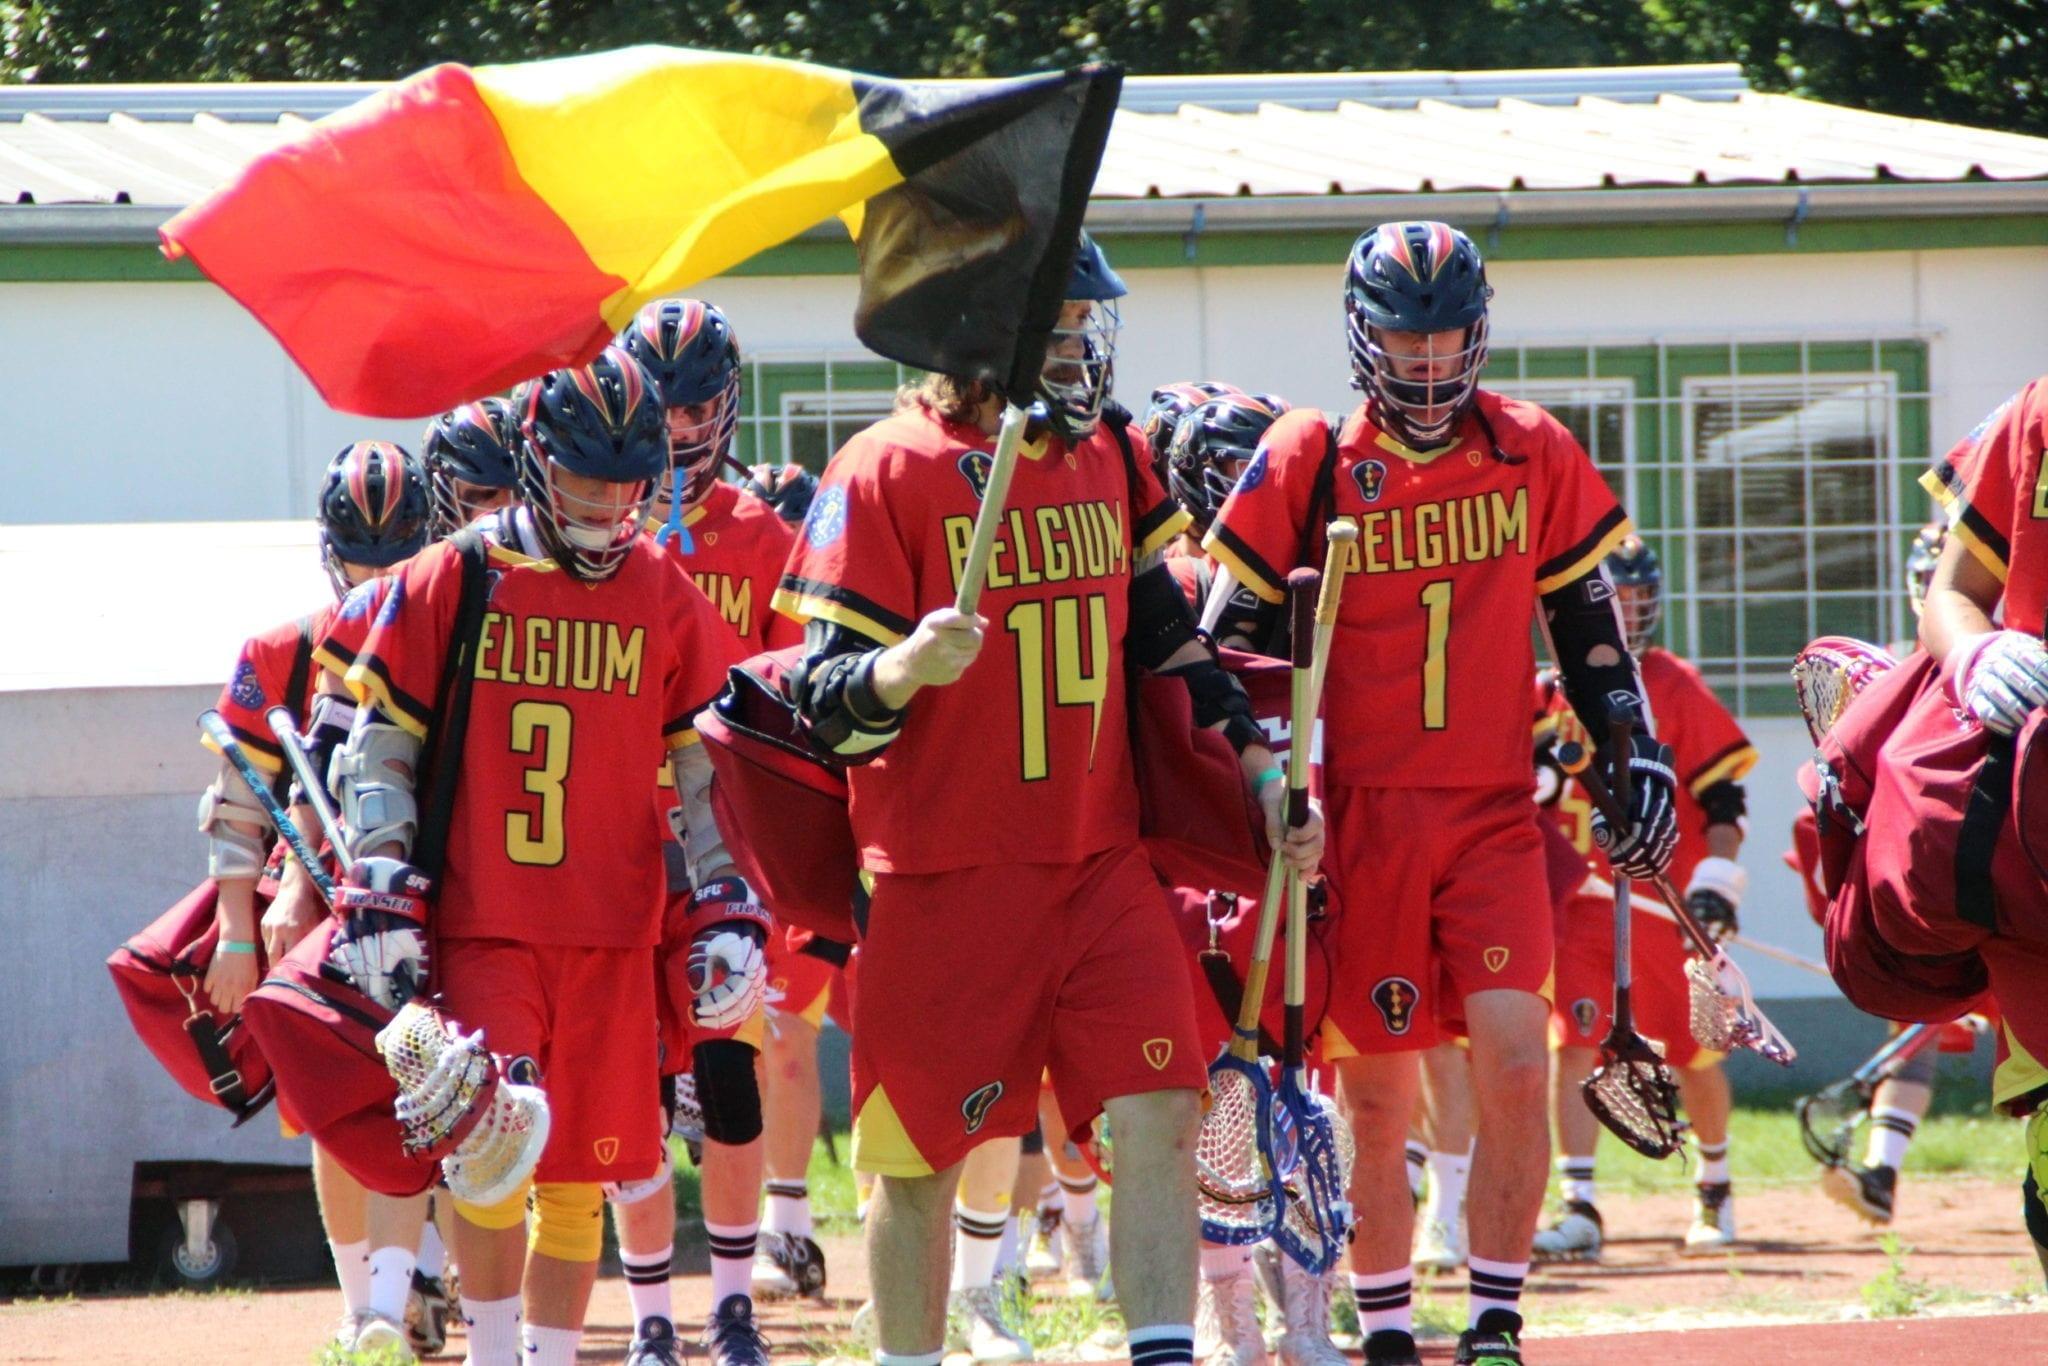 brussels university lacrosse - belgium